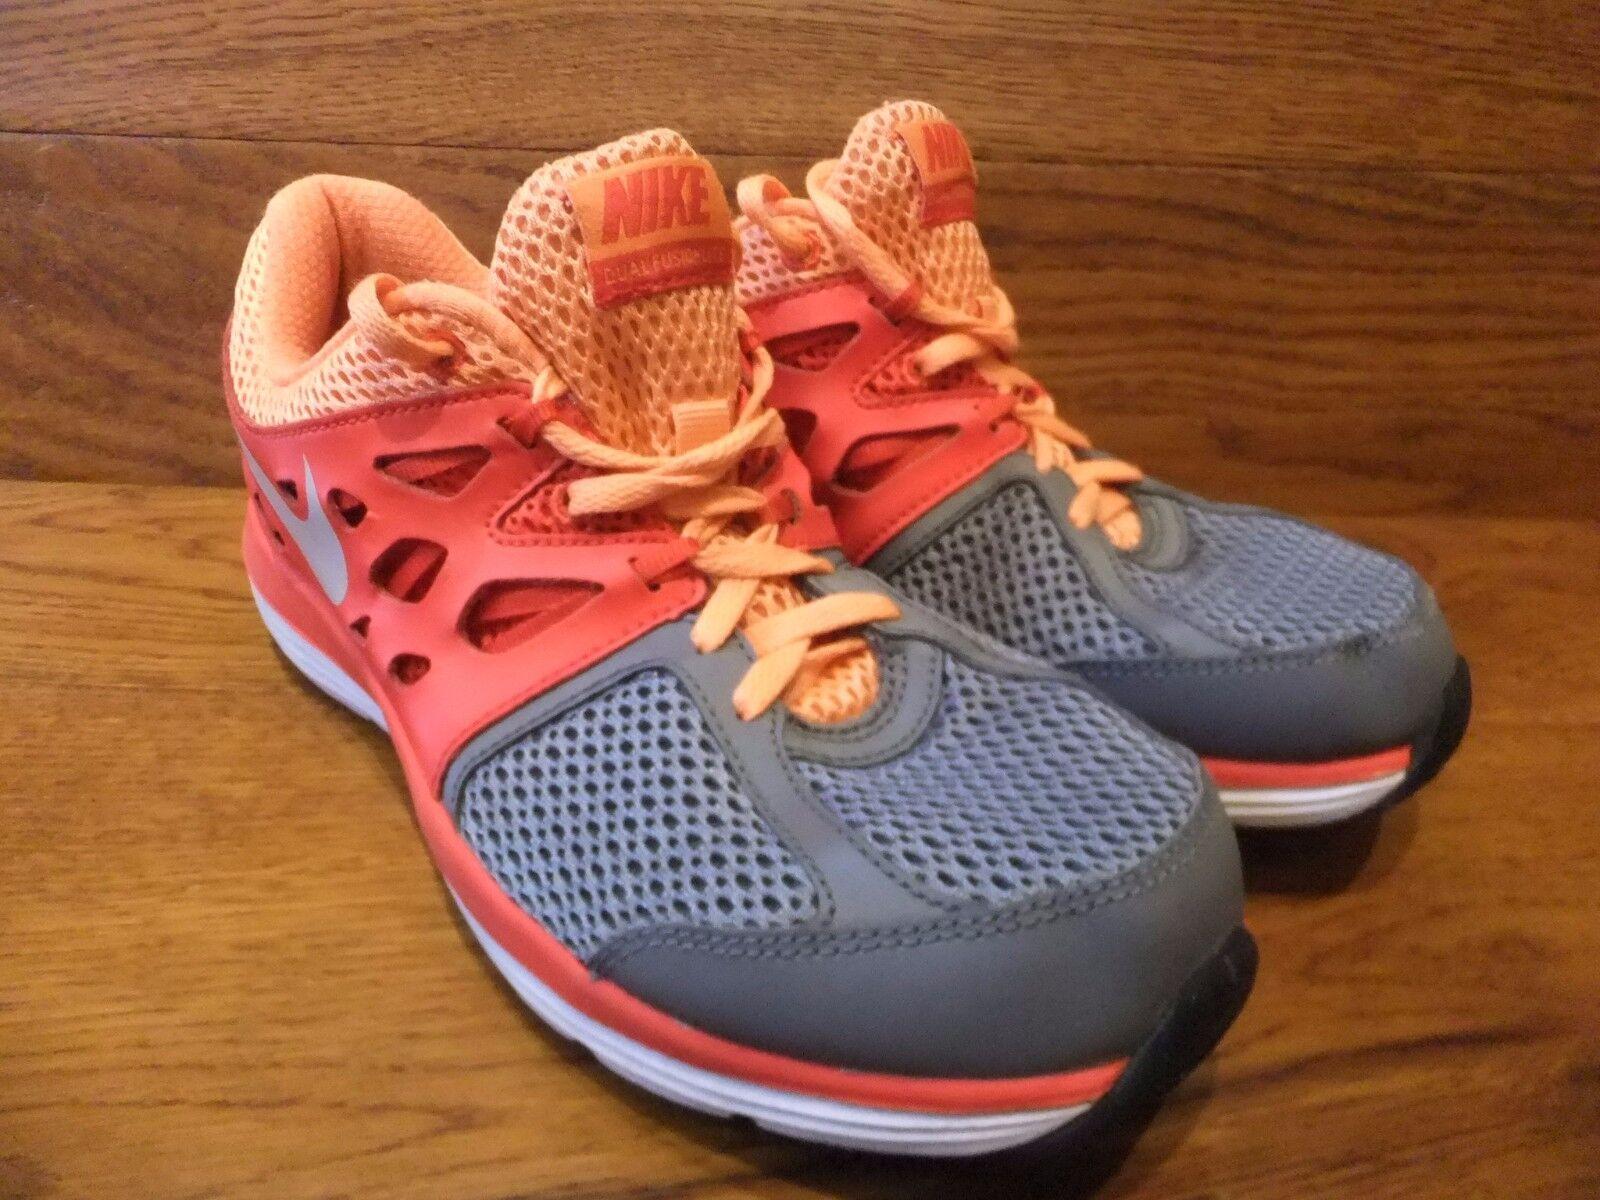 Nike Dual Fusion Lite Shield RunningShoes Trainers Comfortable Cheap and beautiful fashion